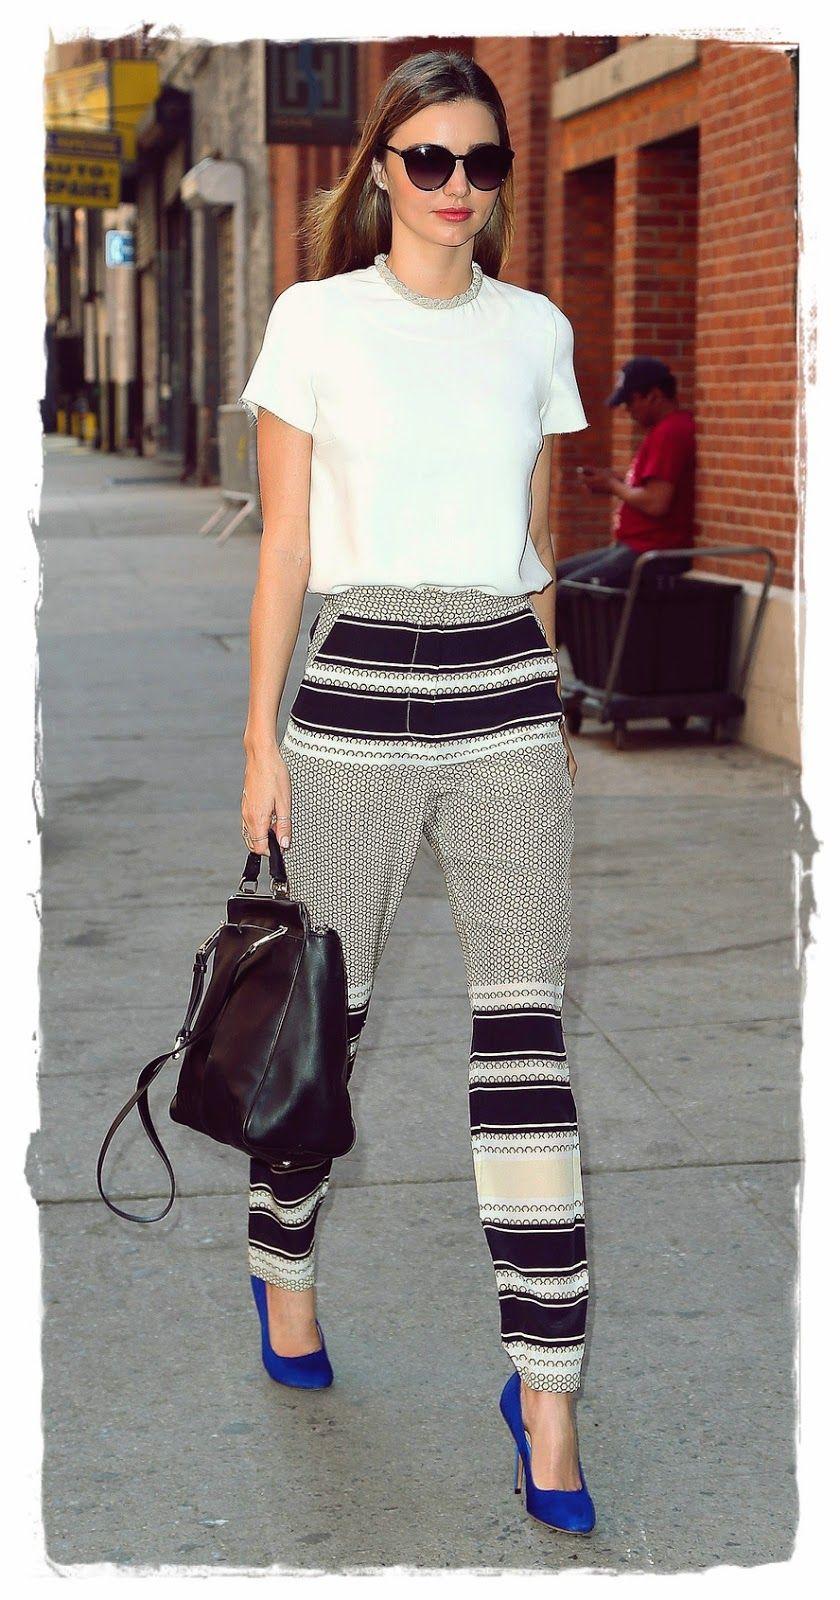 badce75a1169  Miranda  Kerr Street Style Snapshot - Crop It